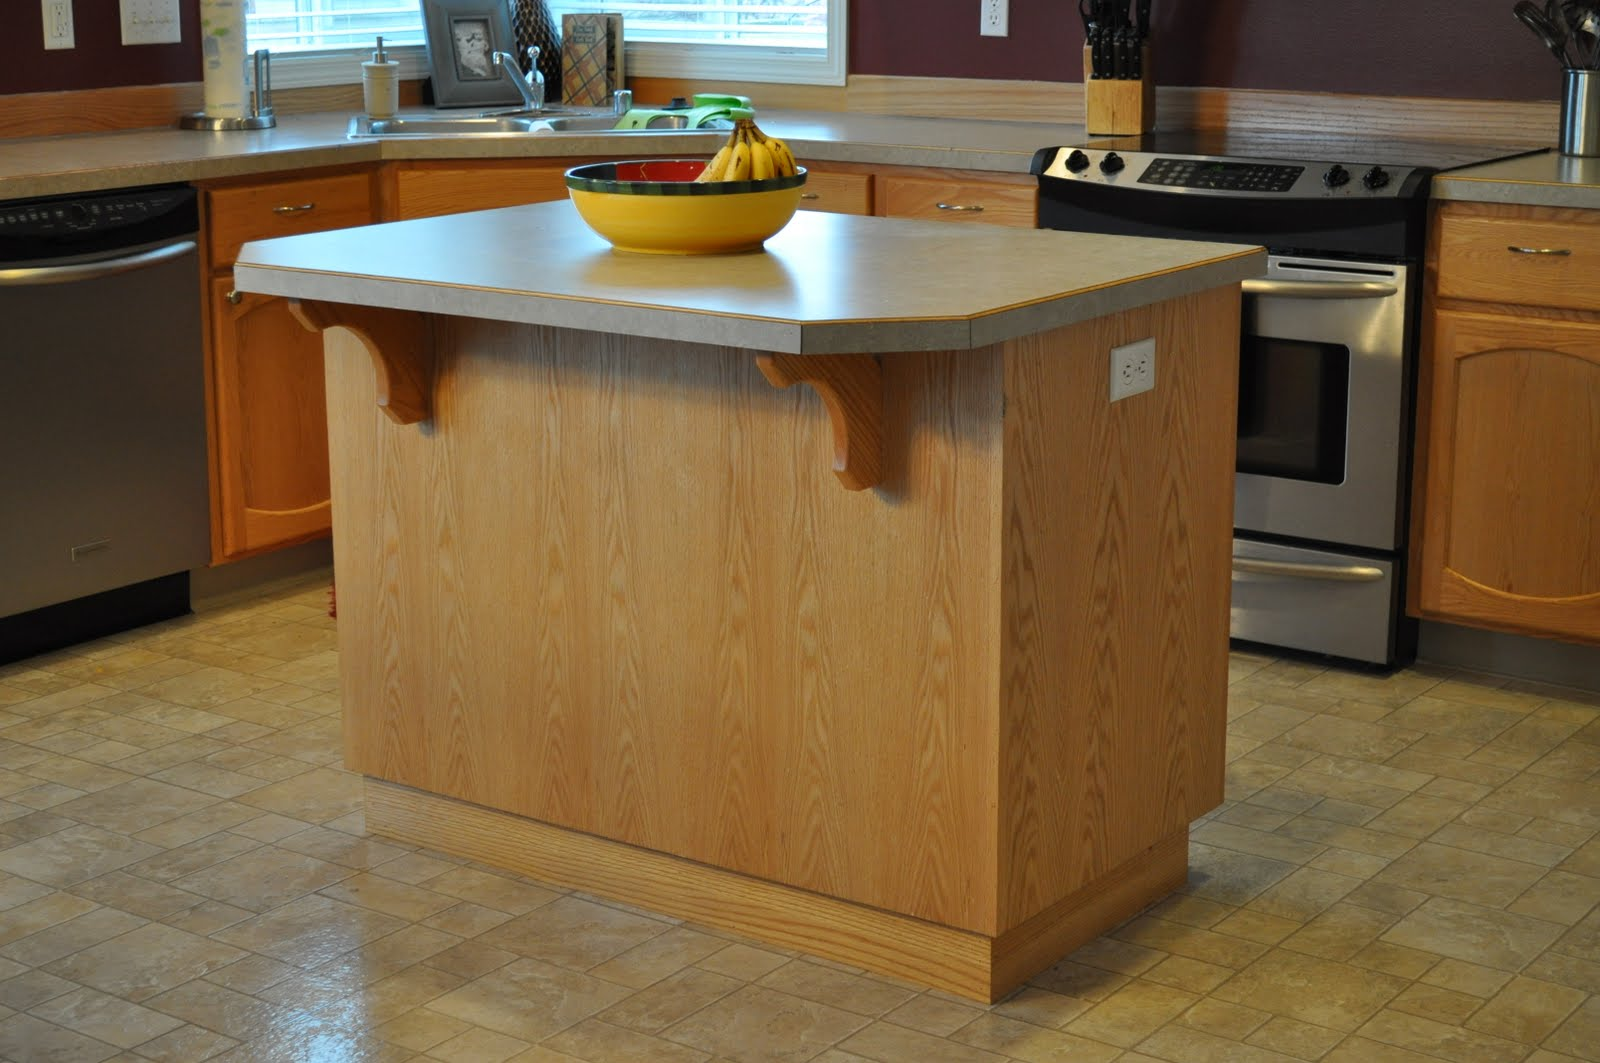 The Dizzy House: Customizing Your Not-So-Custom Kitchen Island